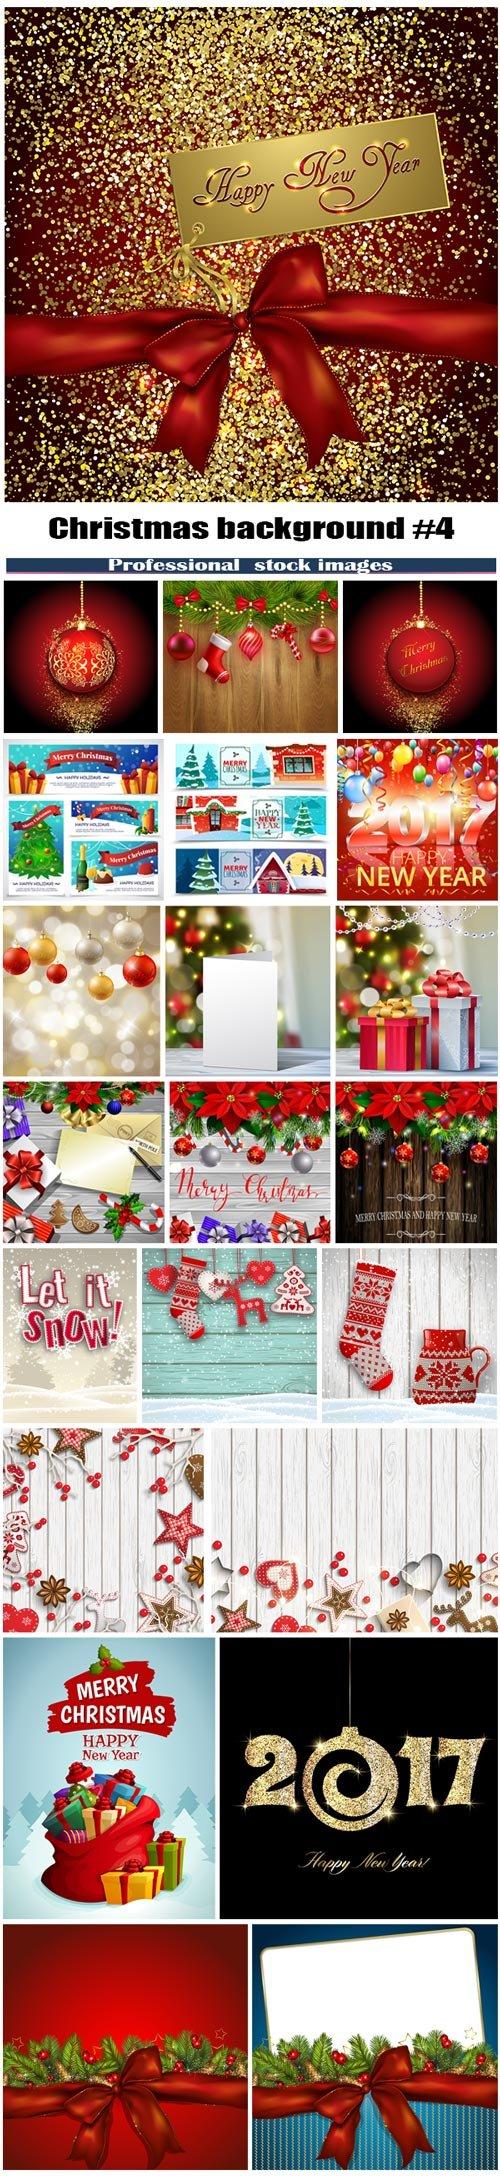 Christmas background #4